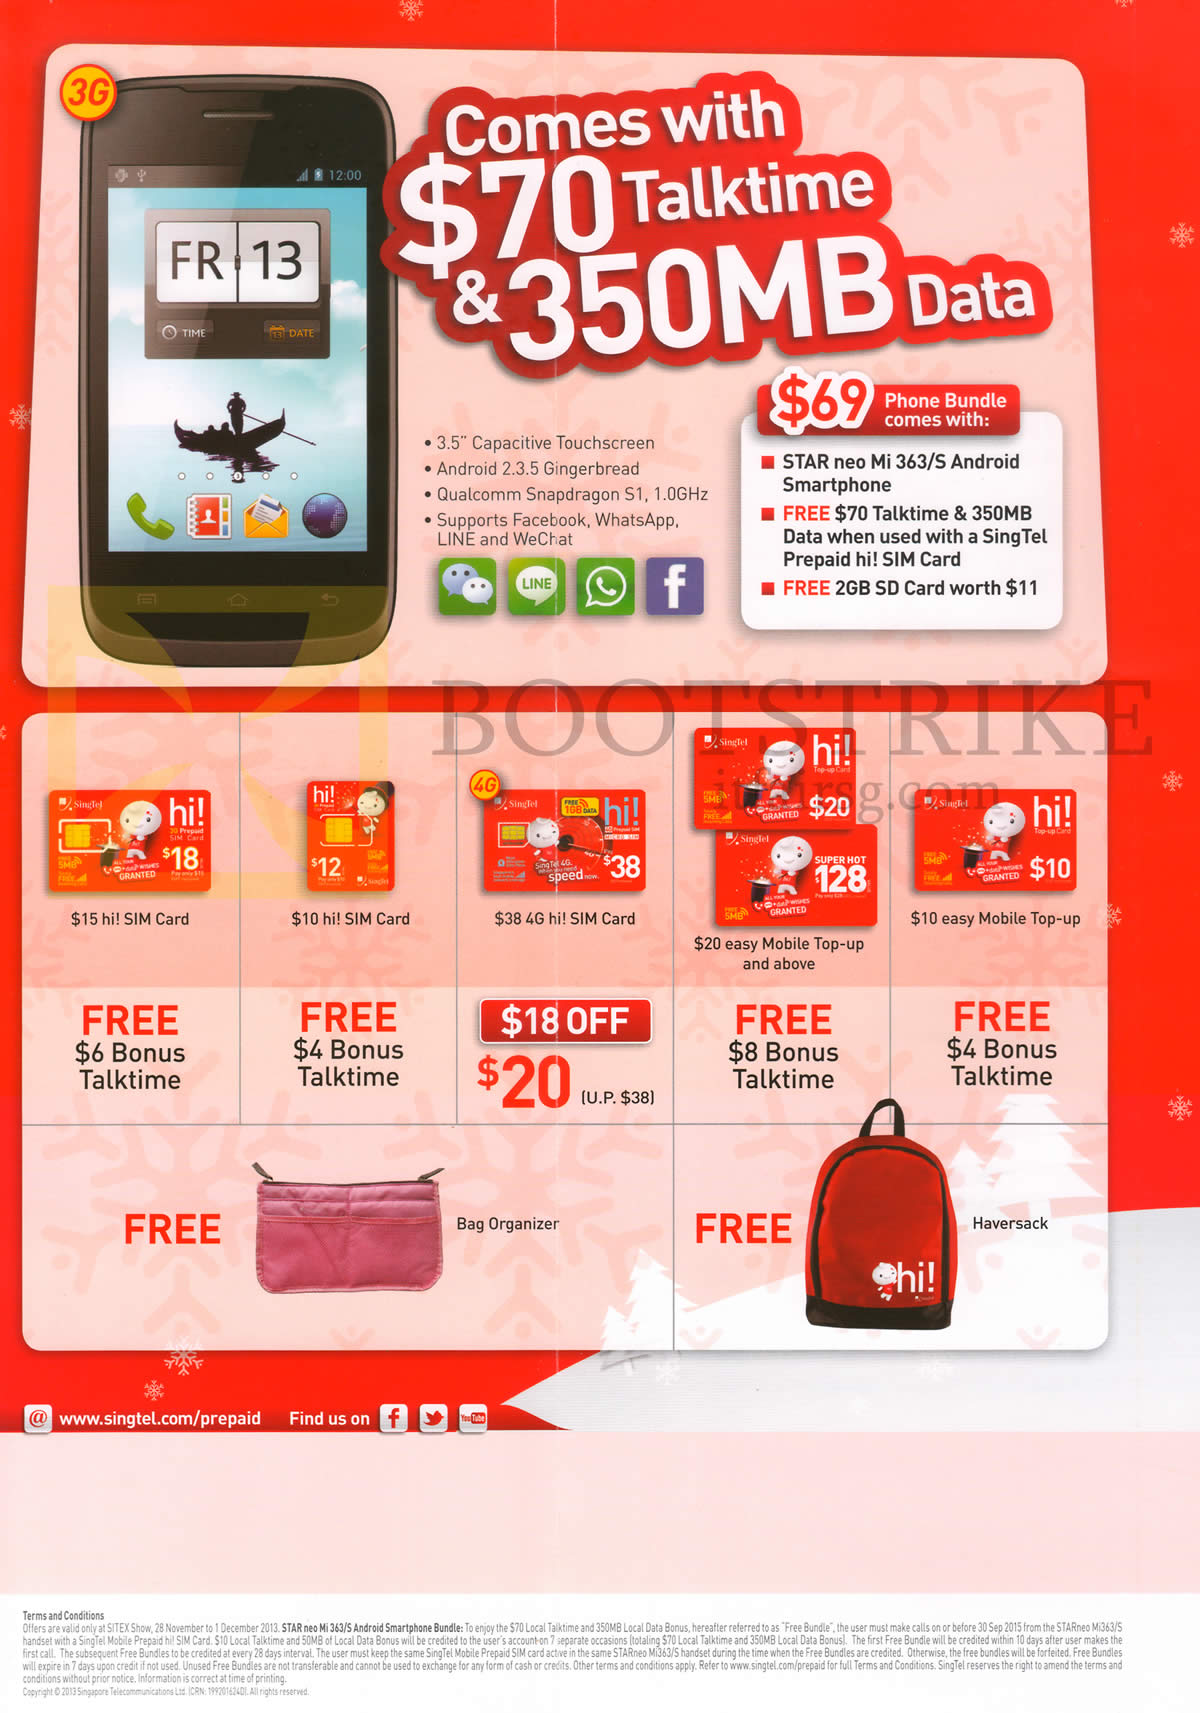 Singtel Mobile Prepaid Hi Card, Star Neo Mi 363 Android, Sim Card